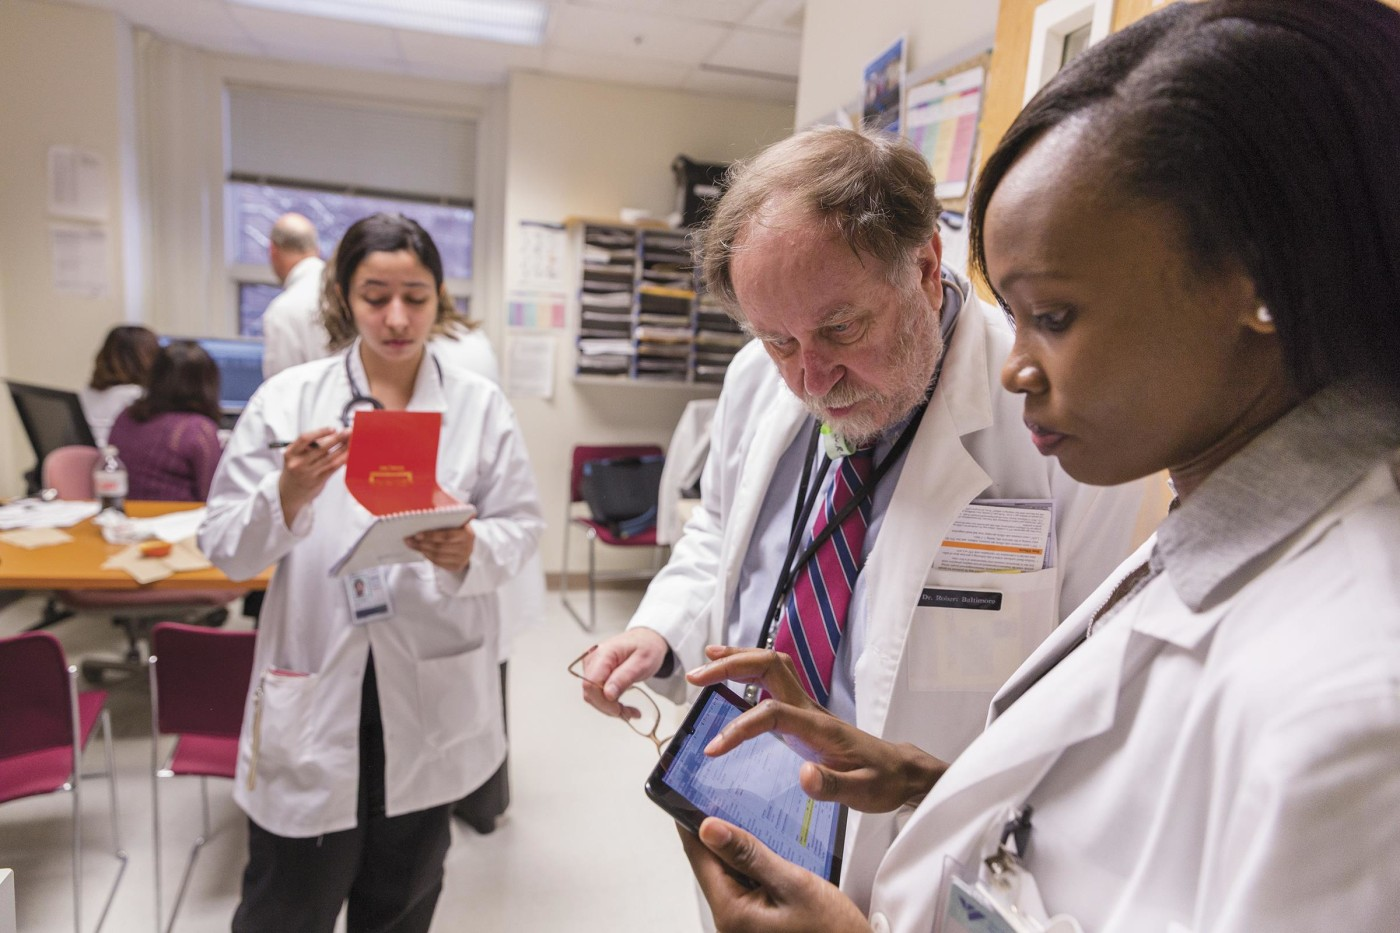 medical student Ruth Wang'ondu and Robert Baltimore, the clinic's director